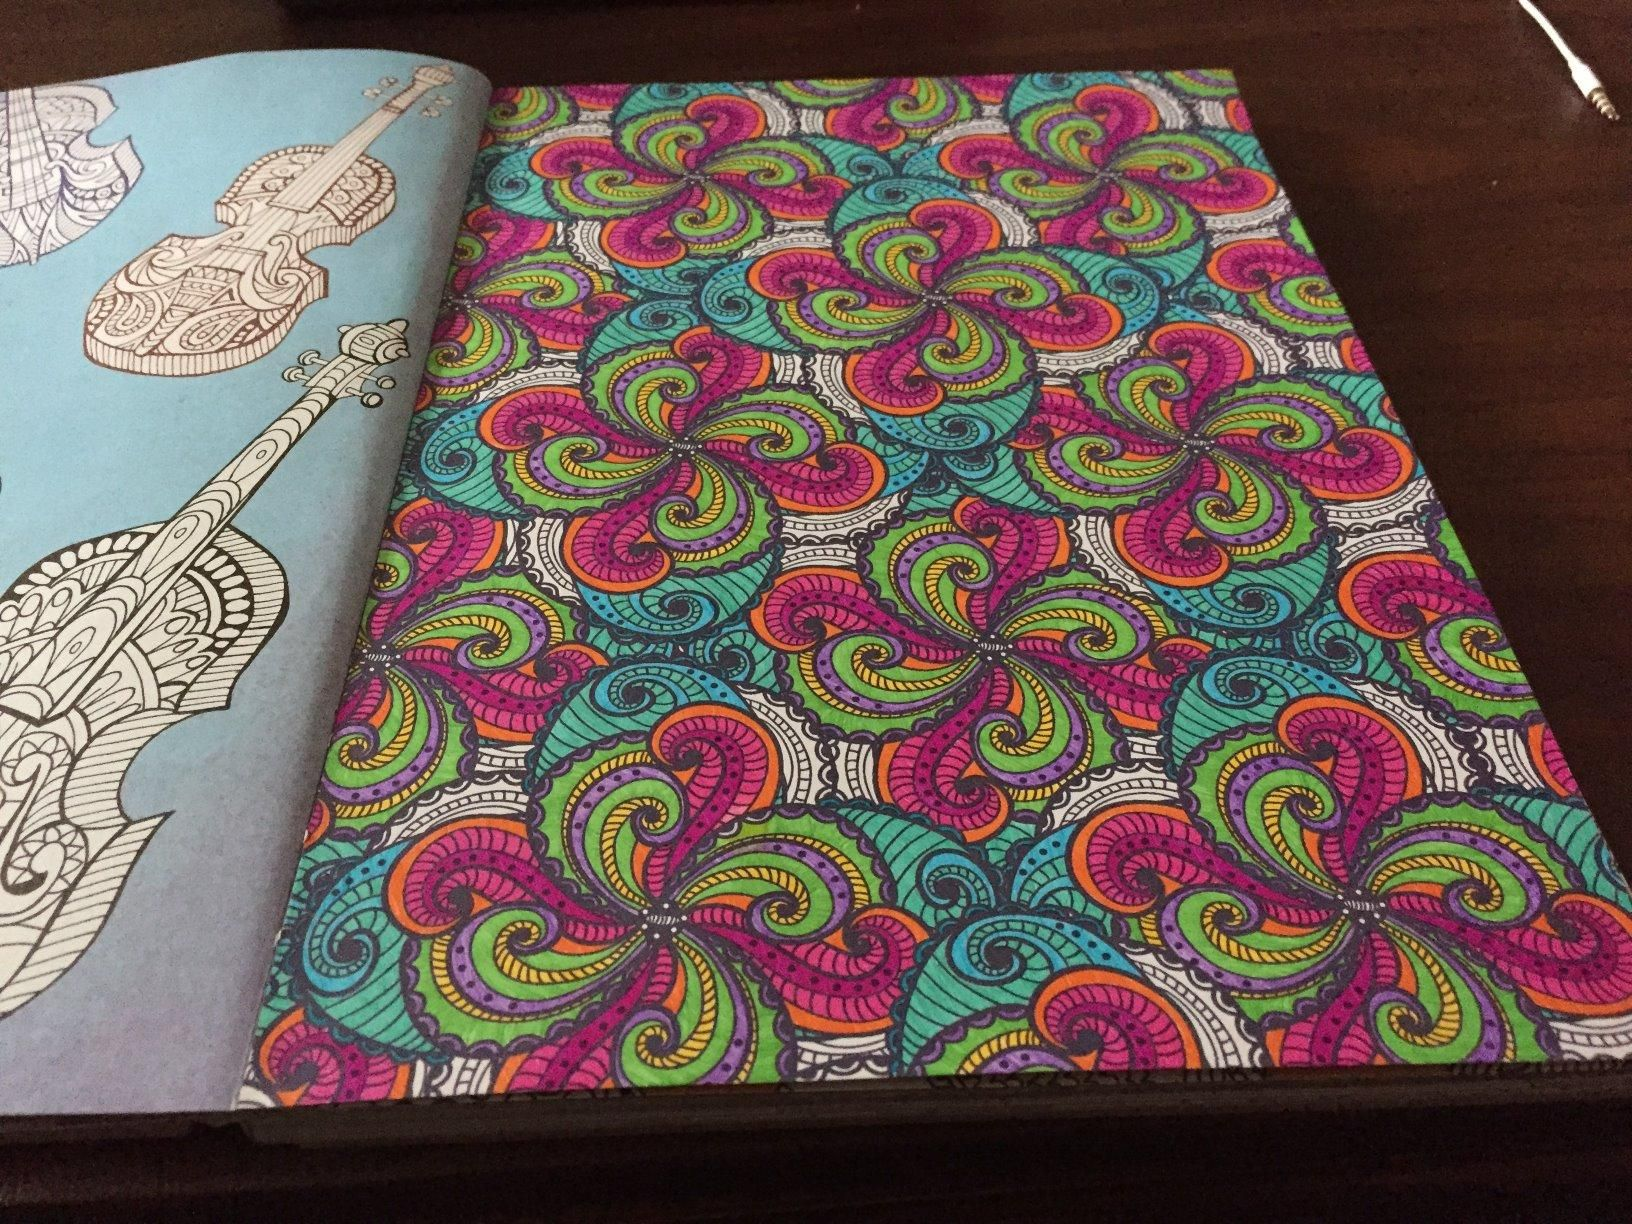 Amazon Com Creative Therapy An Anti Stress Coloring Book 9780762458813 Hannah Davies Richard Anti Stress Coloring Book Antistress Coloring Coloring Books